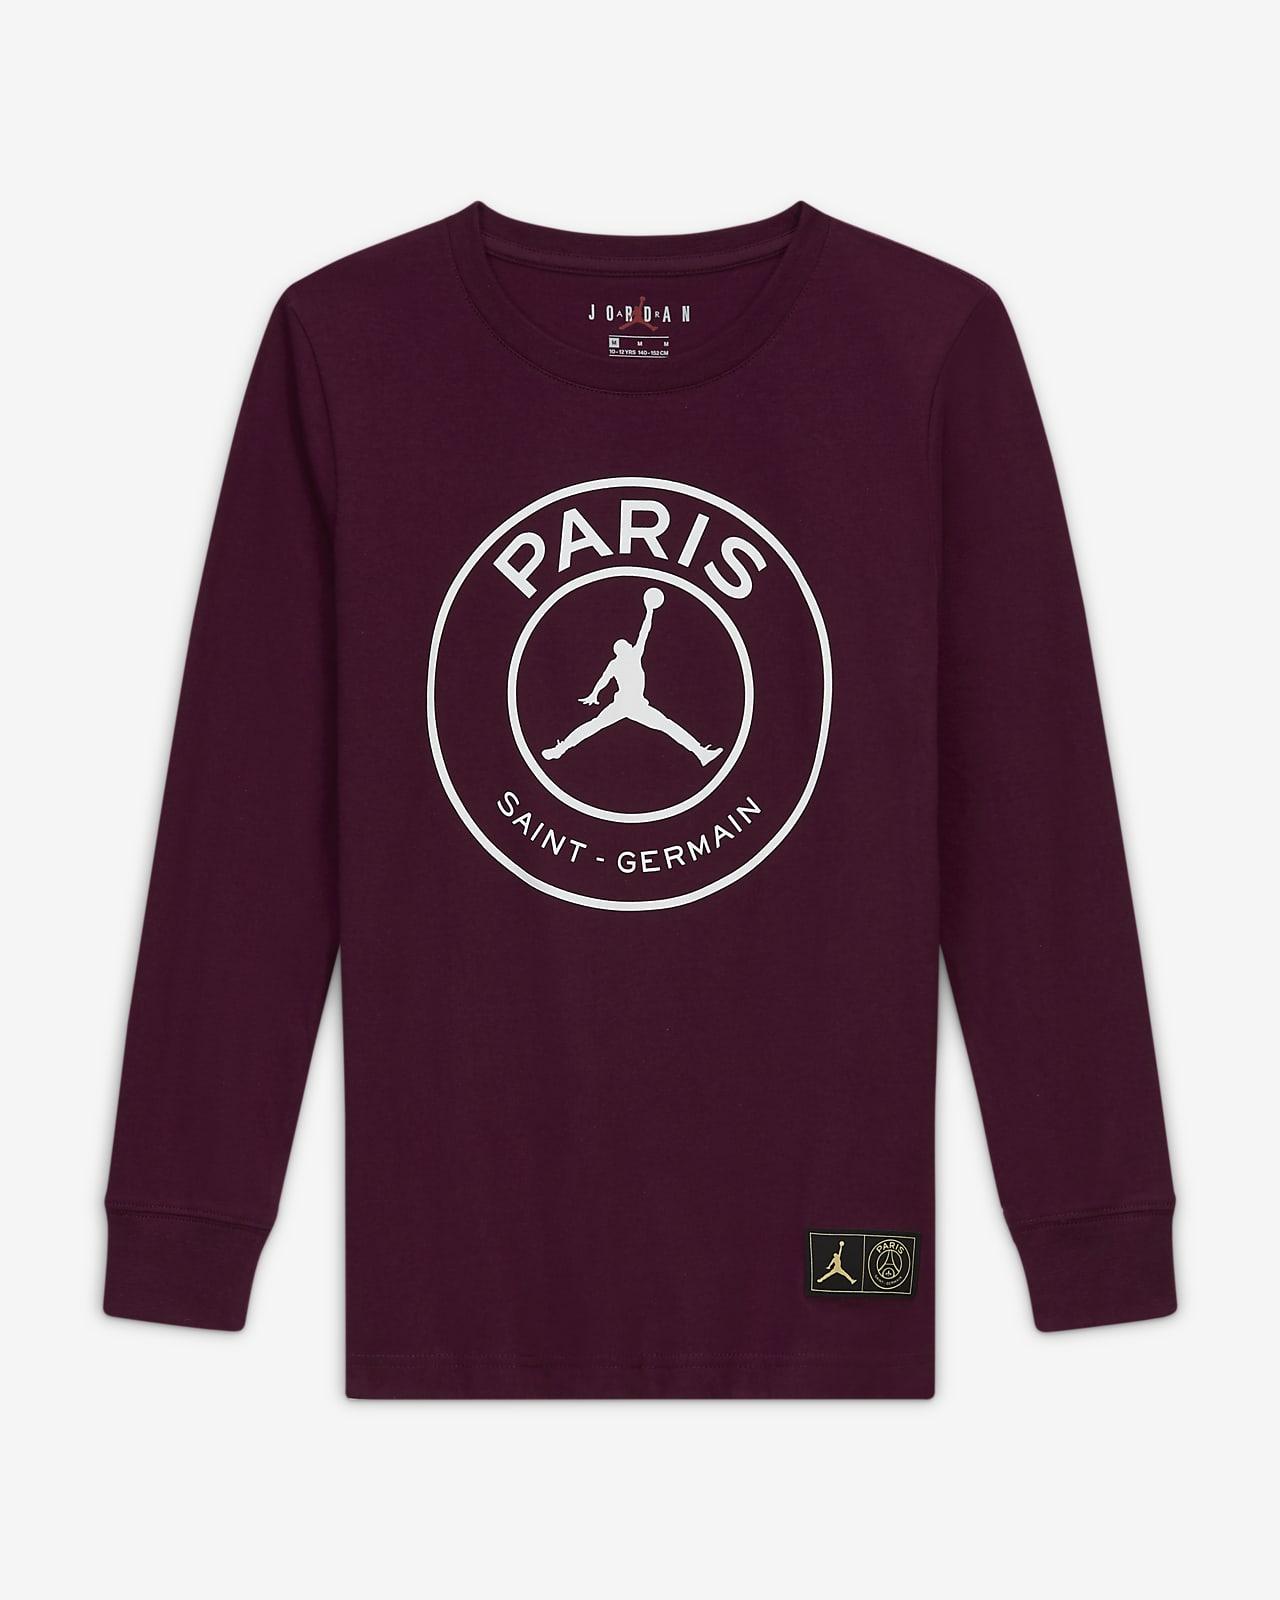 Paris Saint-Germain Big Kids' (Boys') Long-Sleeve T-Shirt